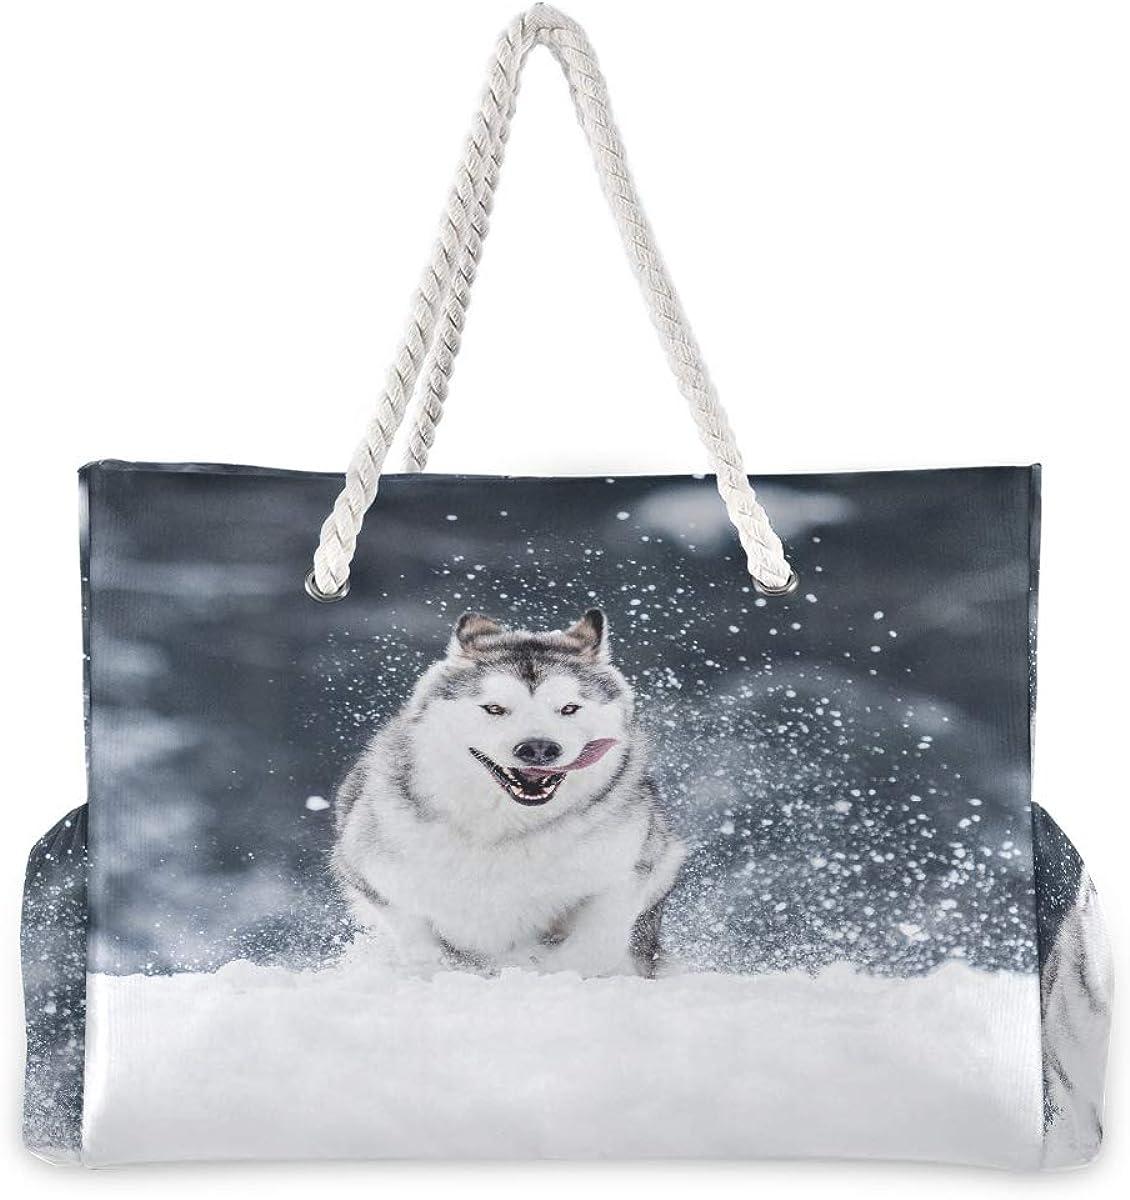 My Best Friend is Alaskan Malamute Messenger Bag